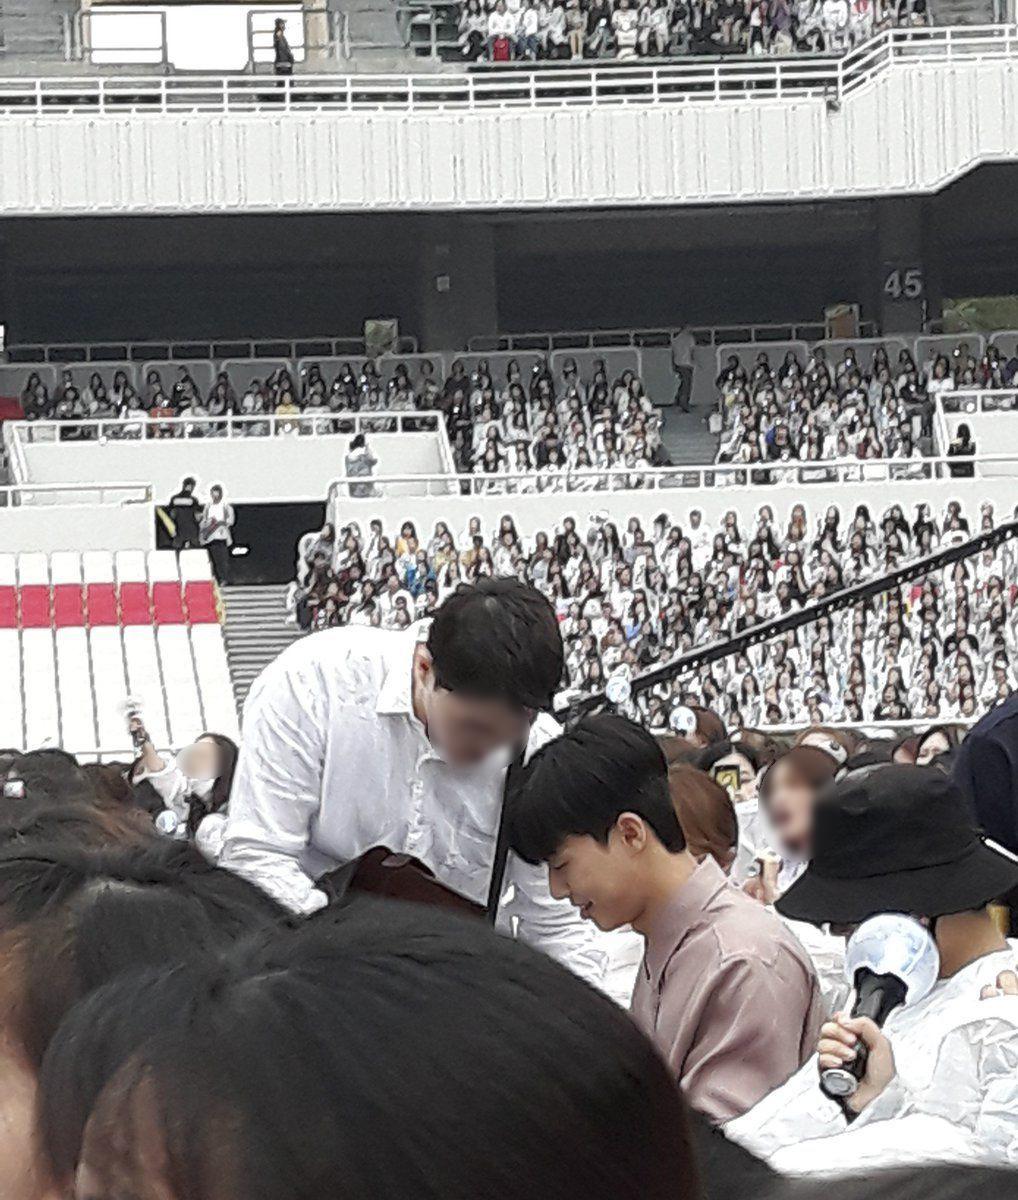 bts concert park seo jun hyung sik 4